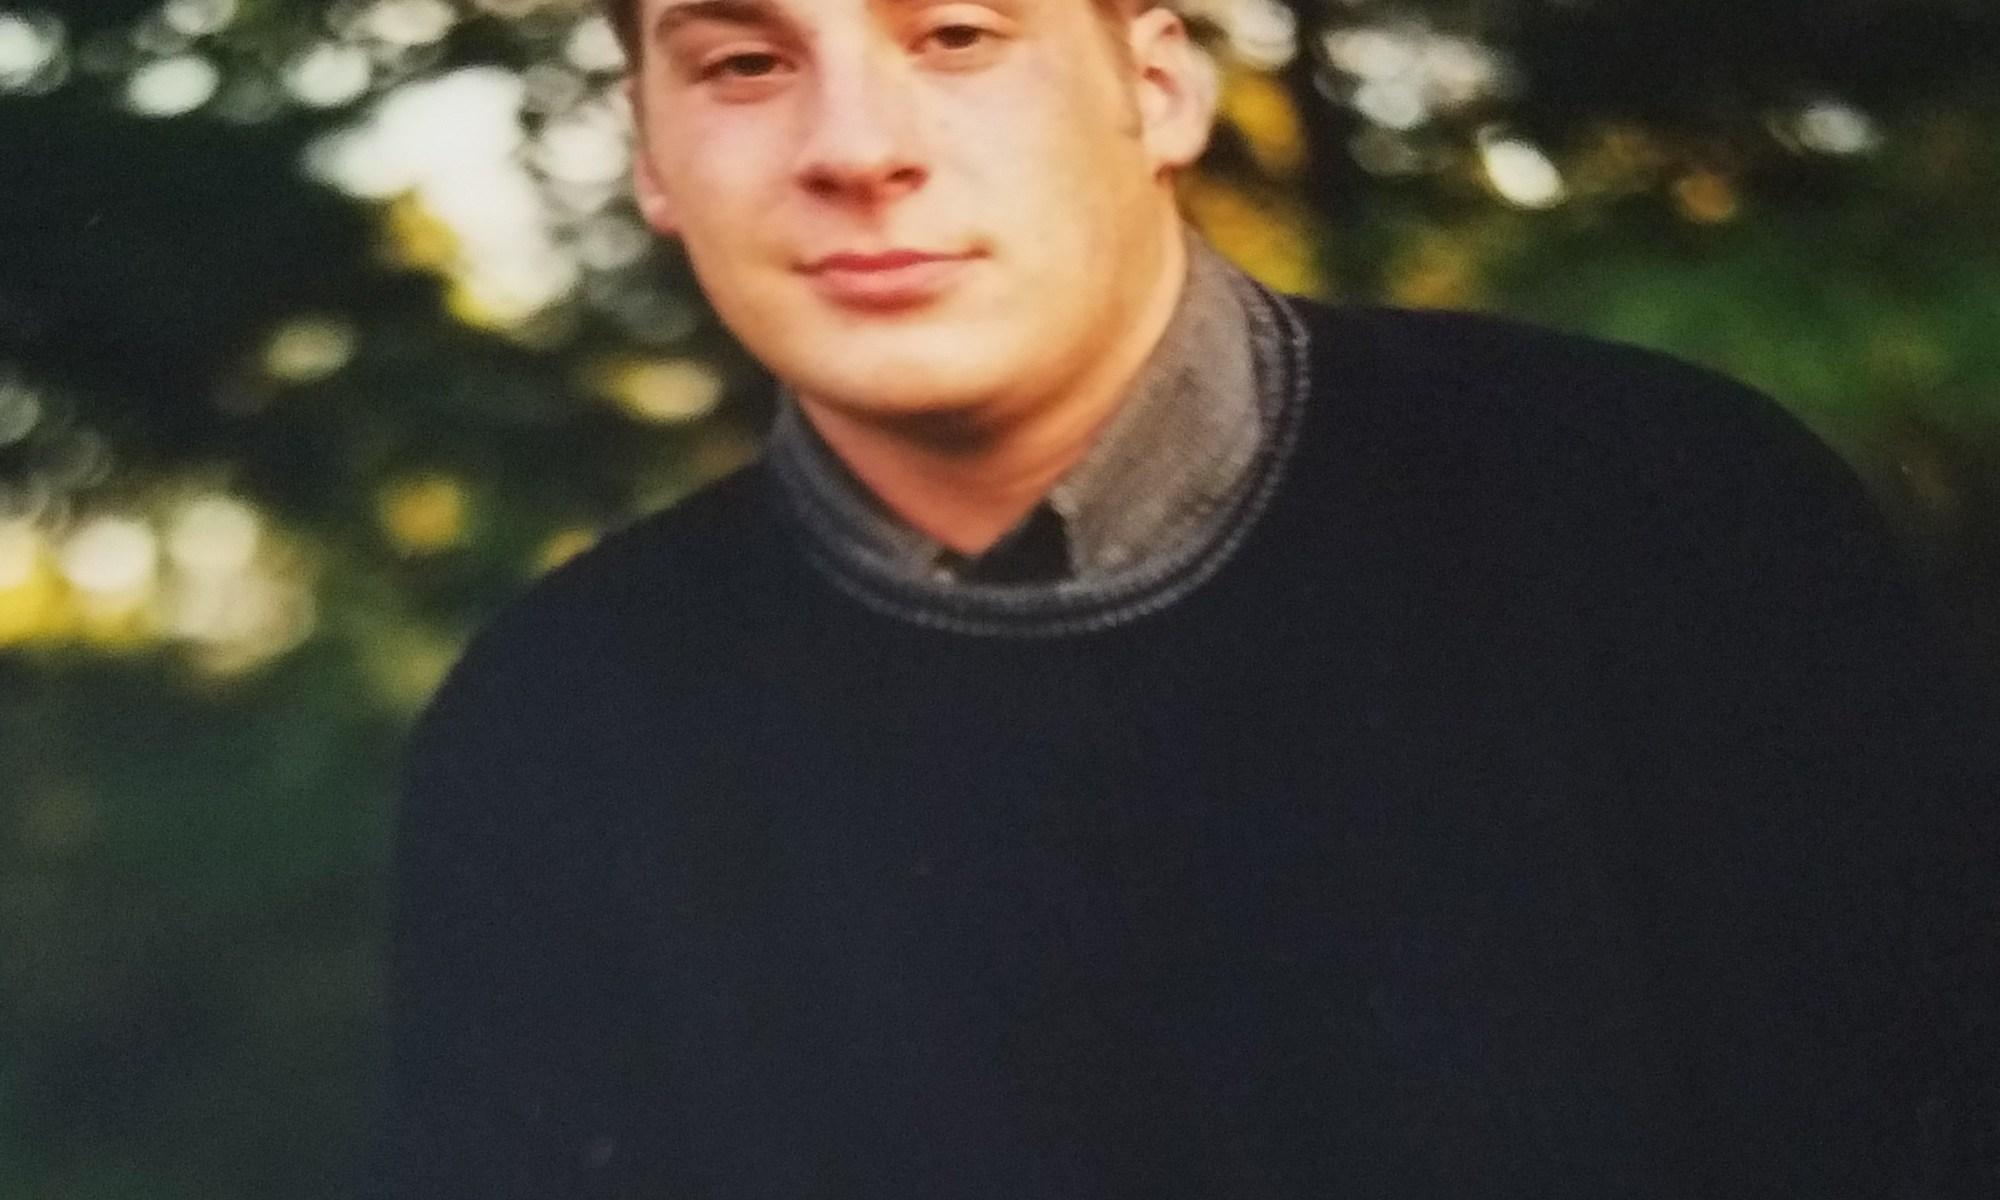 Kevin Hubert